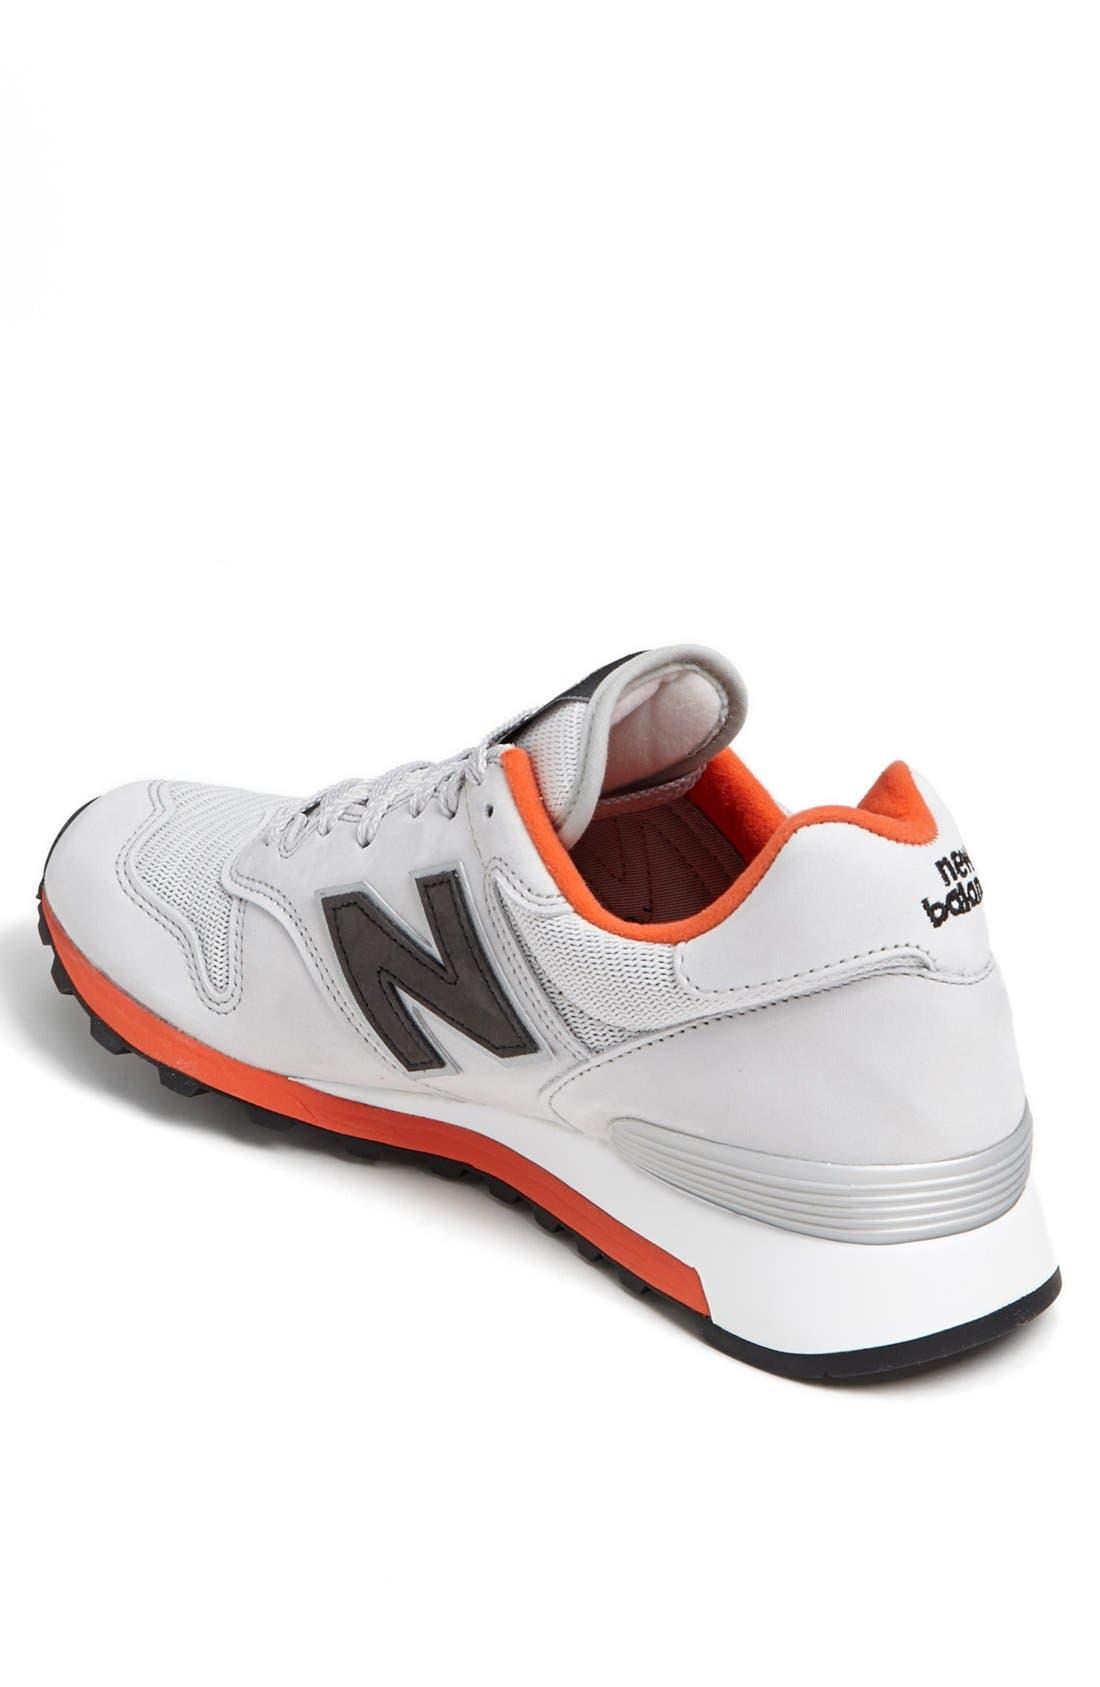 Alternate Image 2  - New Balance '1300 Classic' Sneaker (Men)